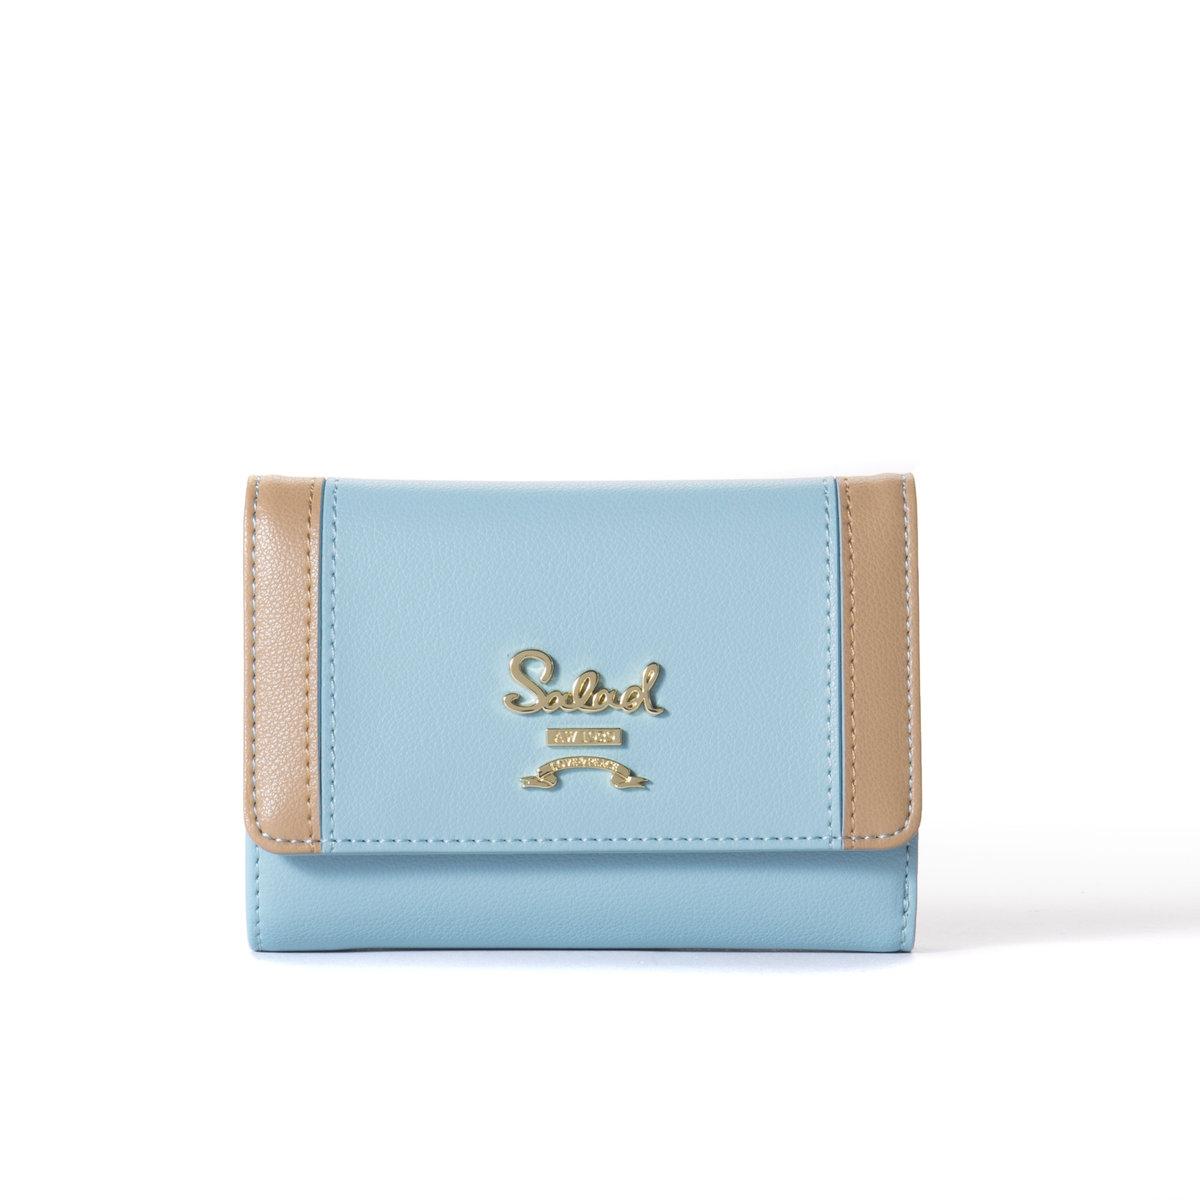 a3281026154d4 Short Leather Wallet-Silver Blue